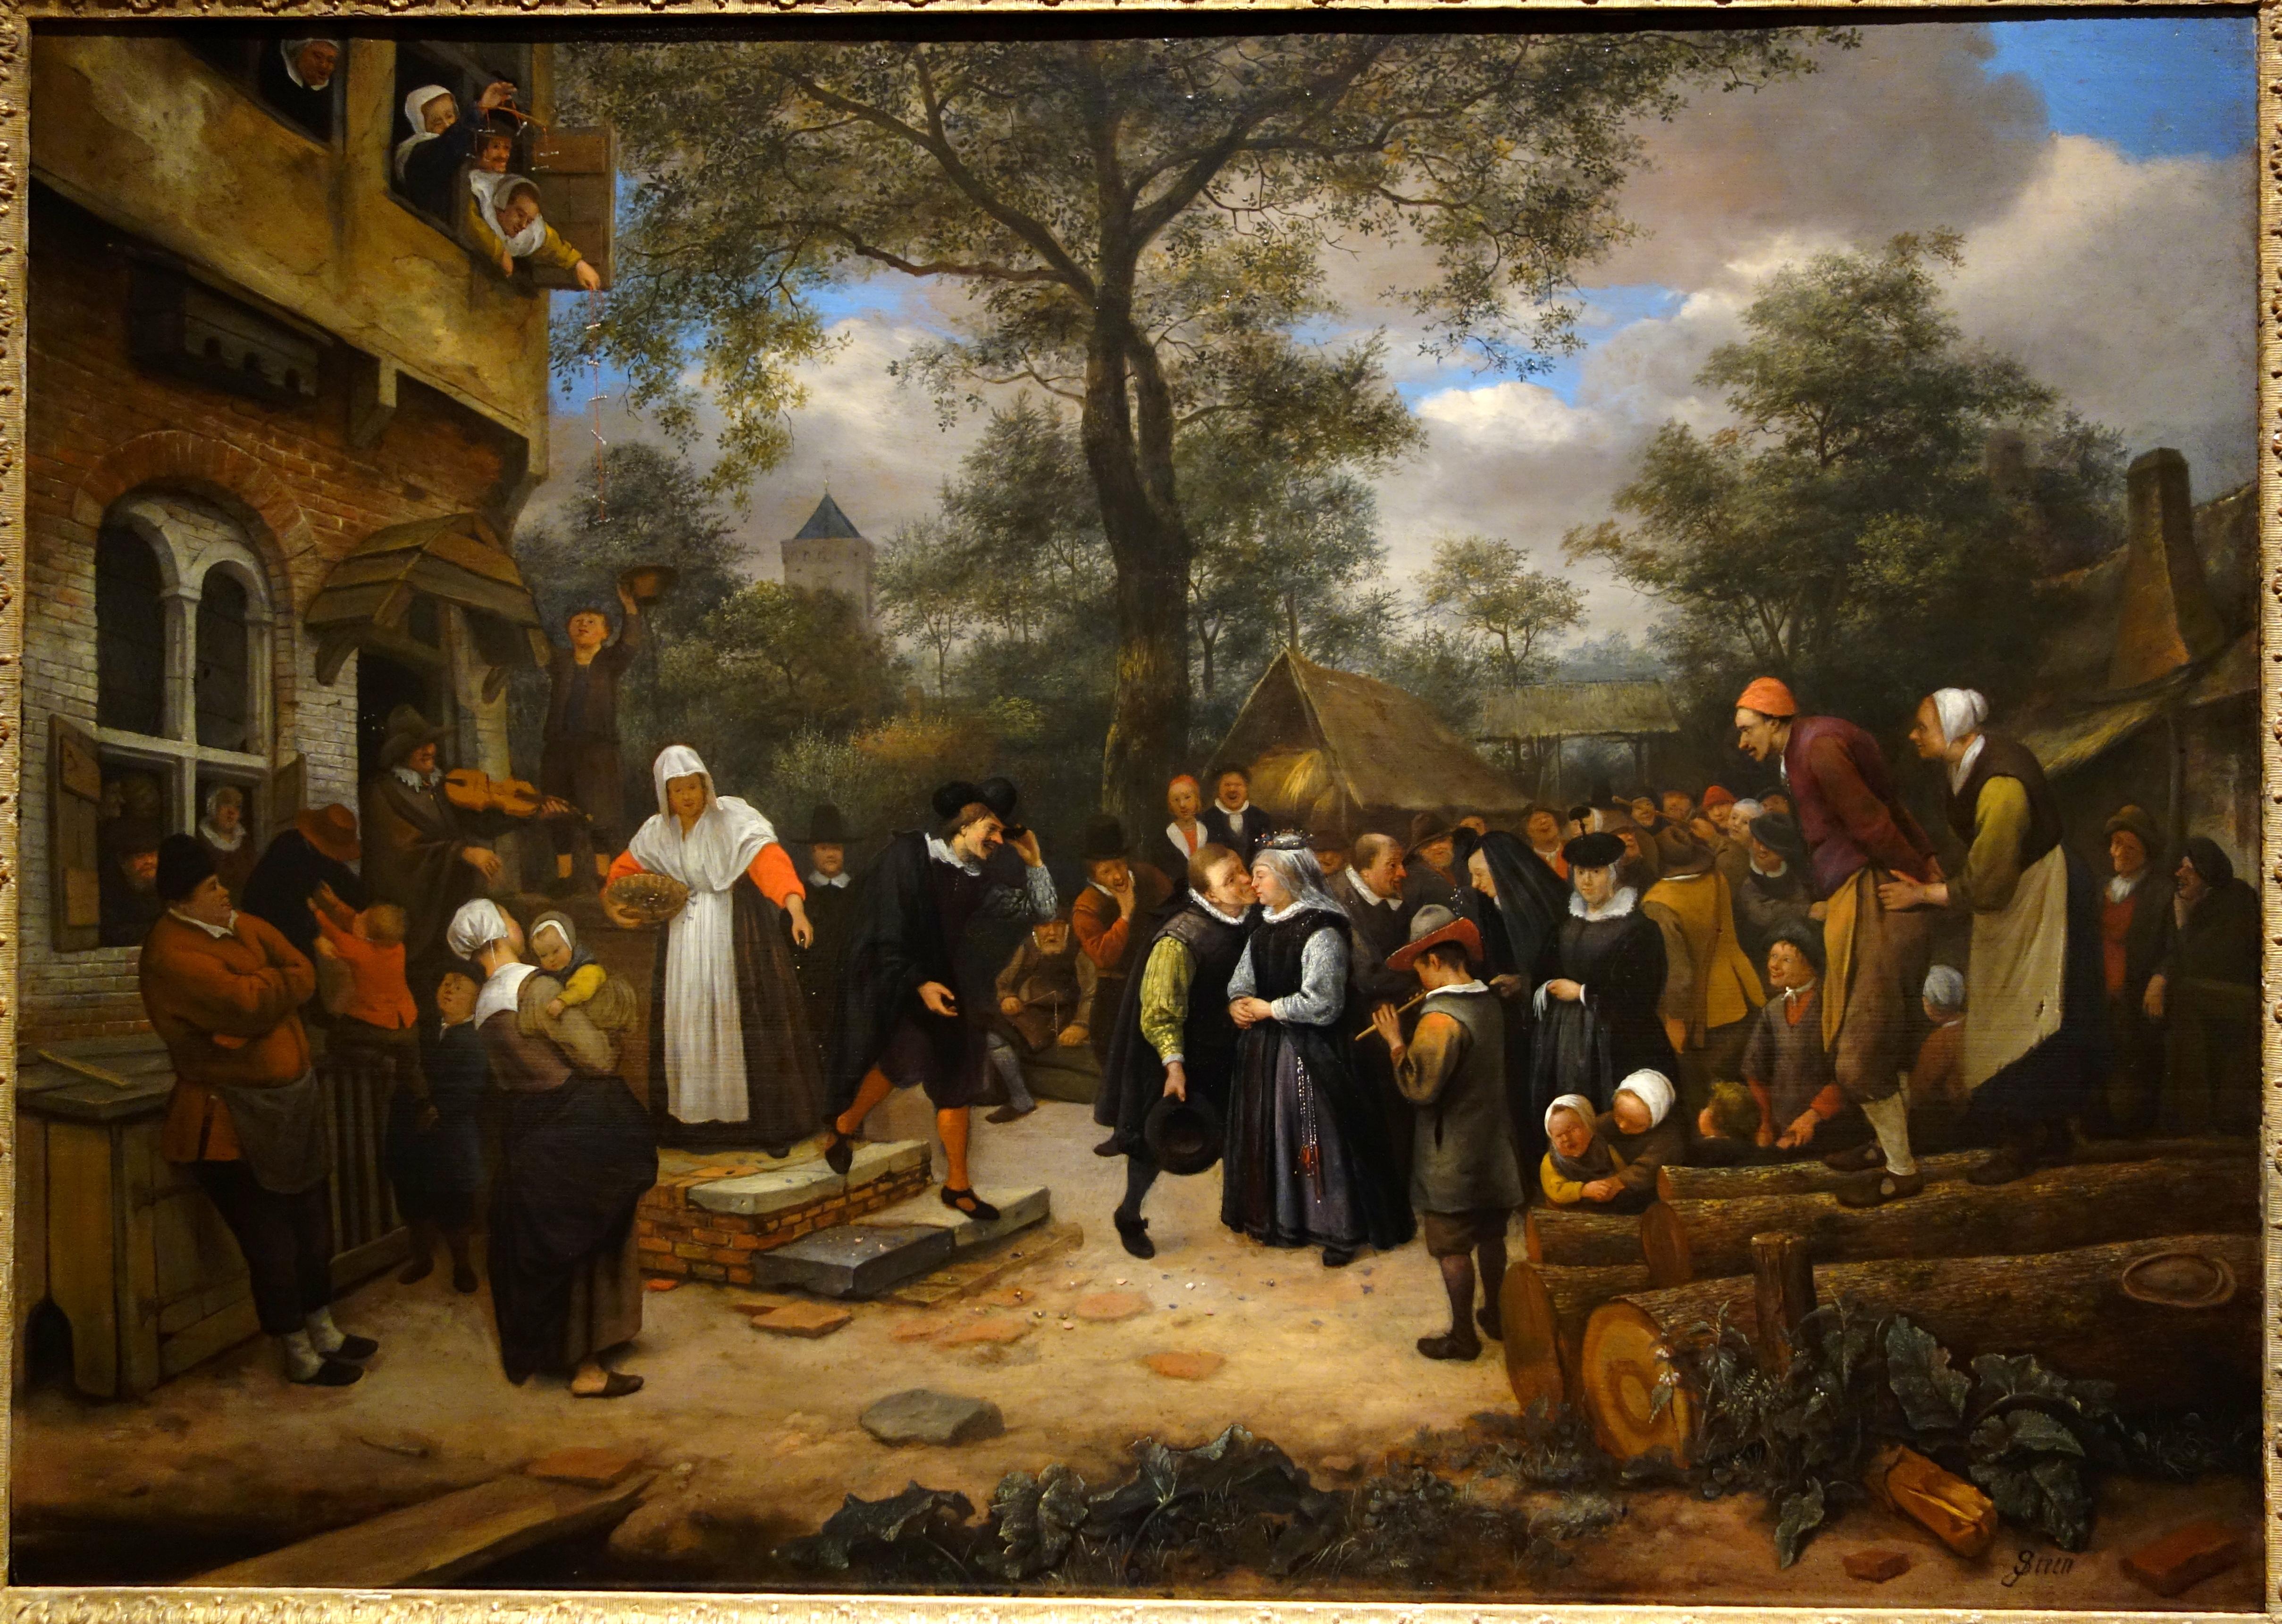 filevillage wedding by jan steen 17th century oil on